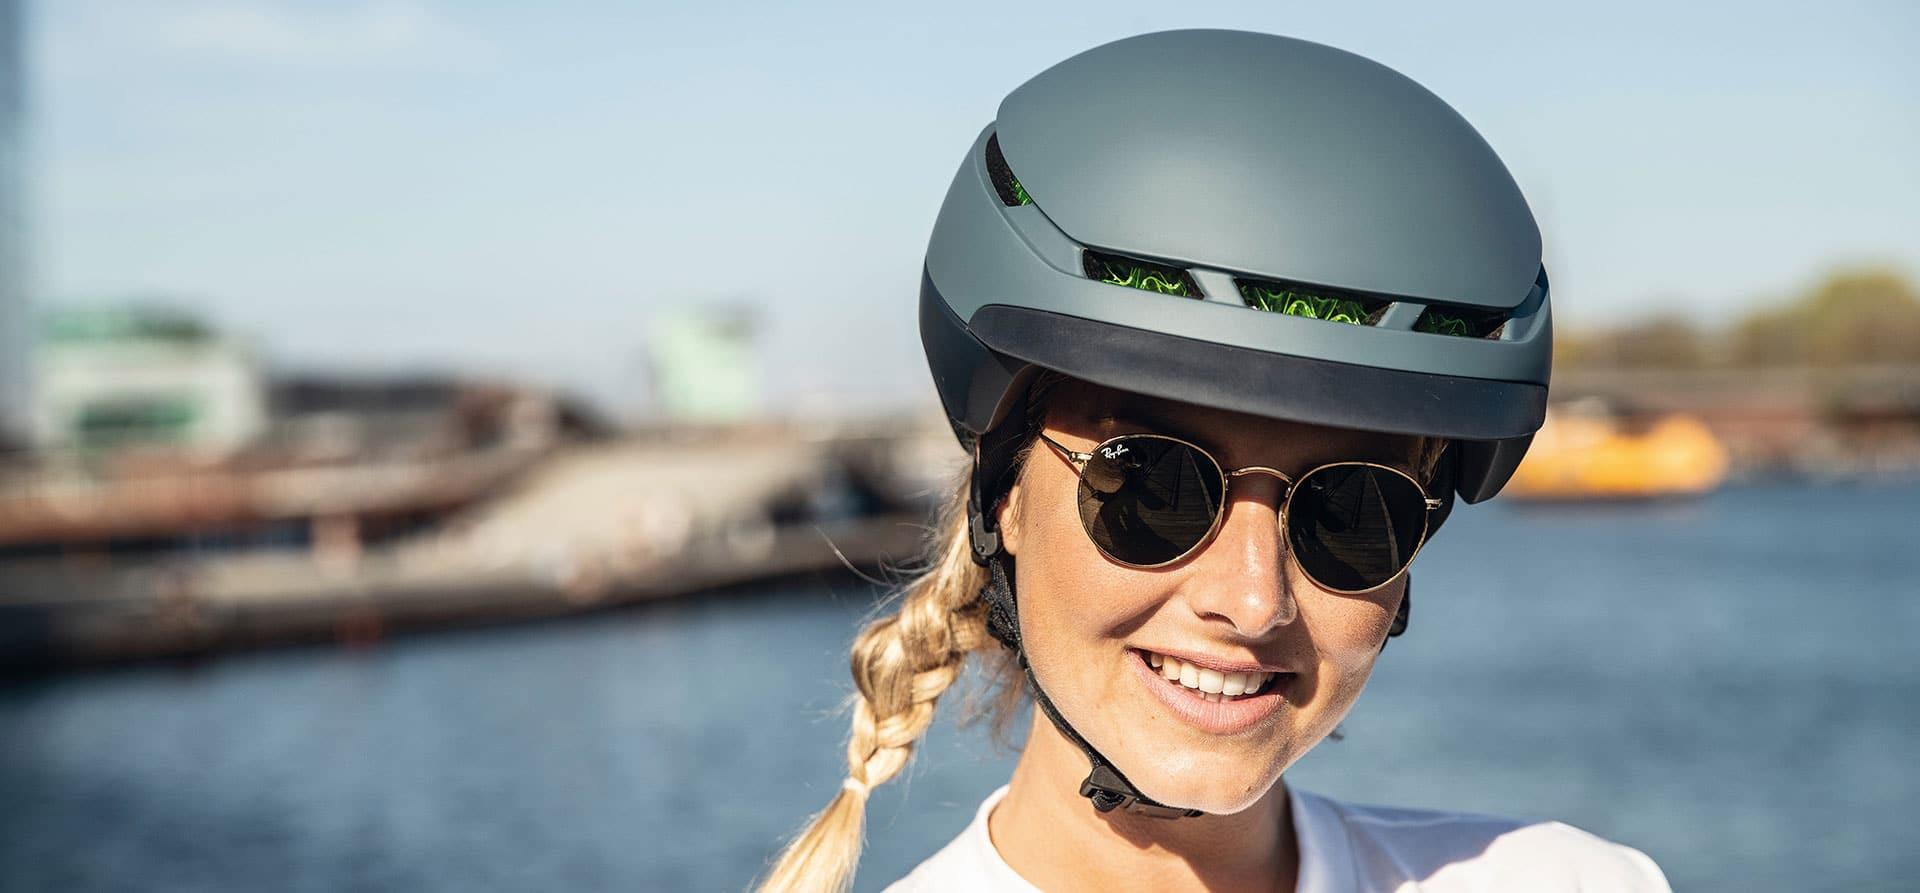 Change your style, change your /*helmet!*/